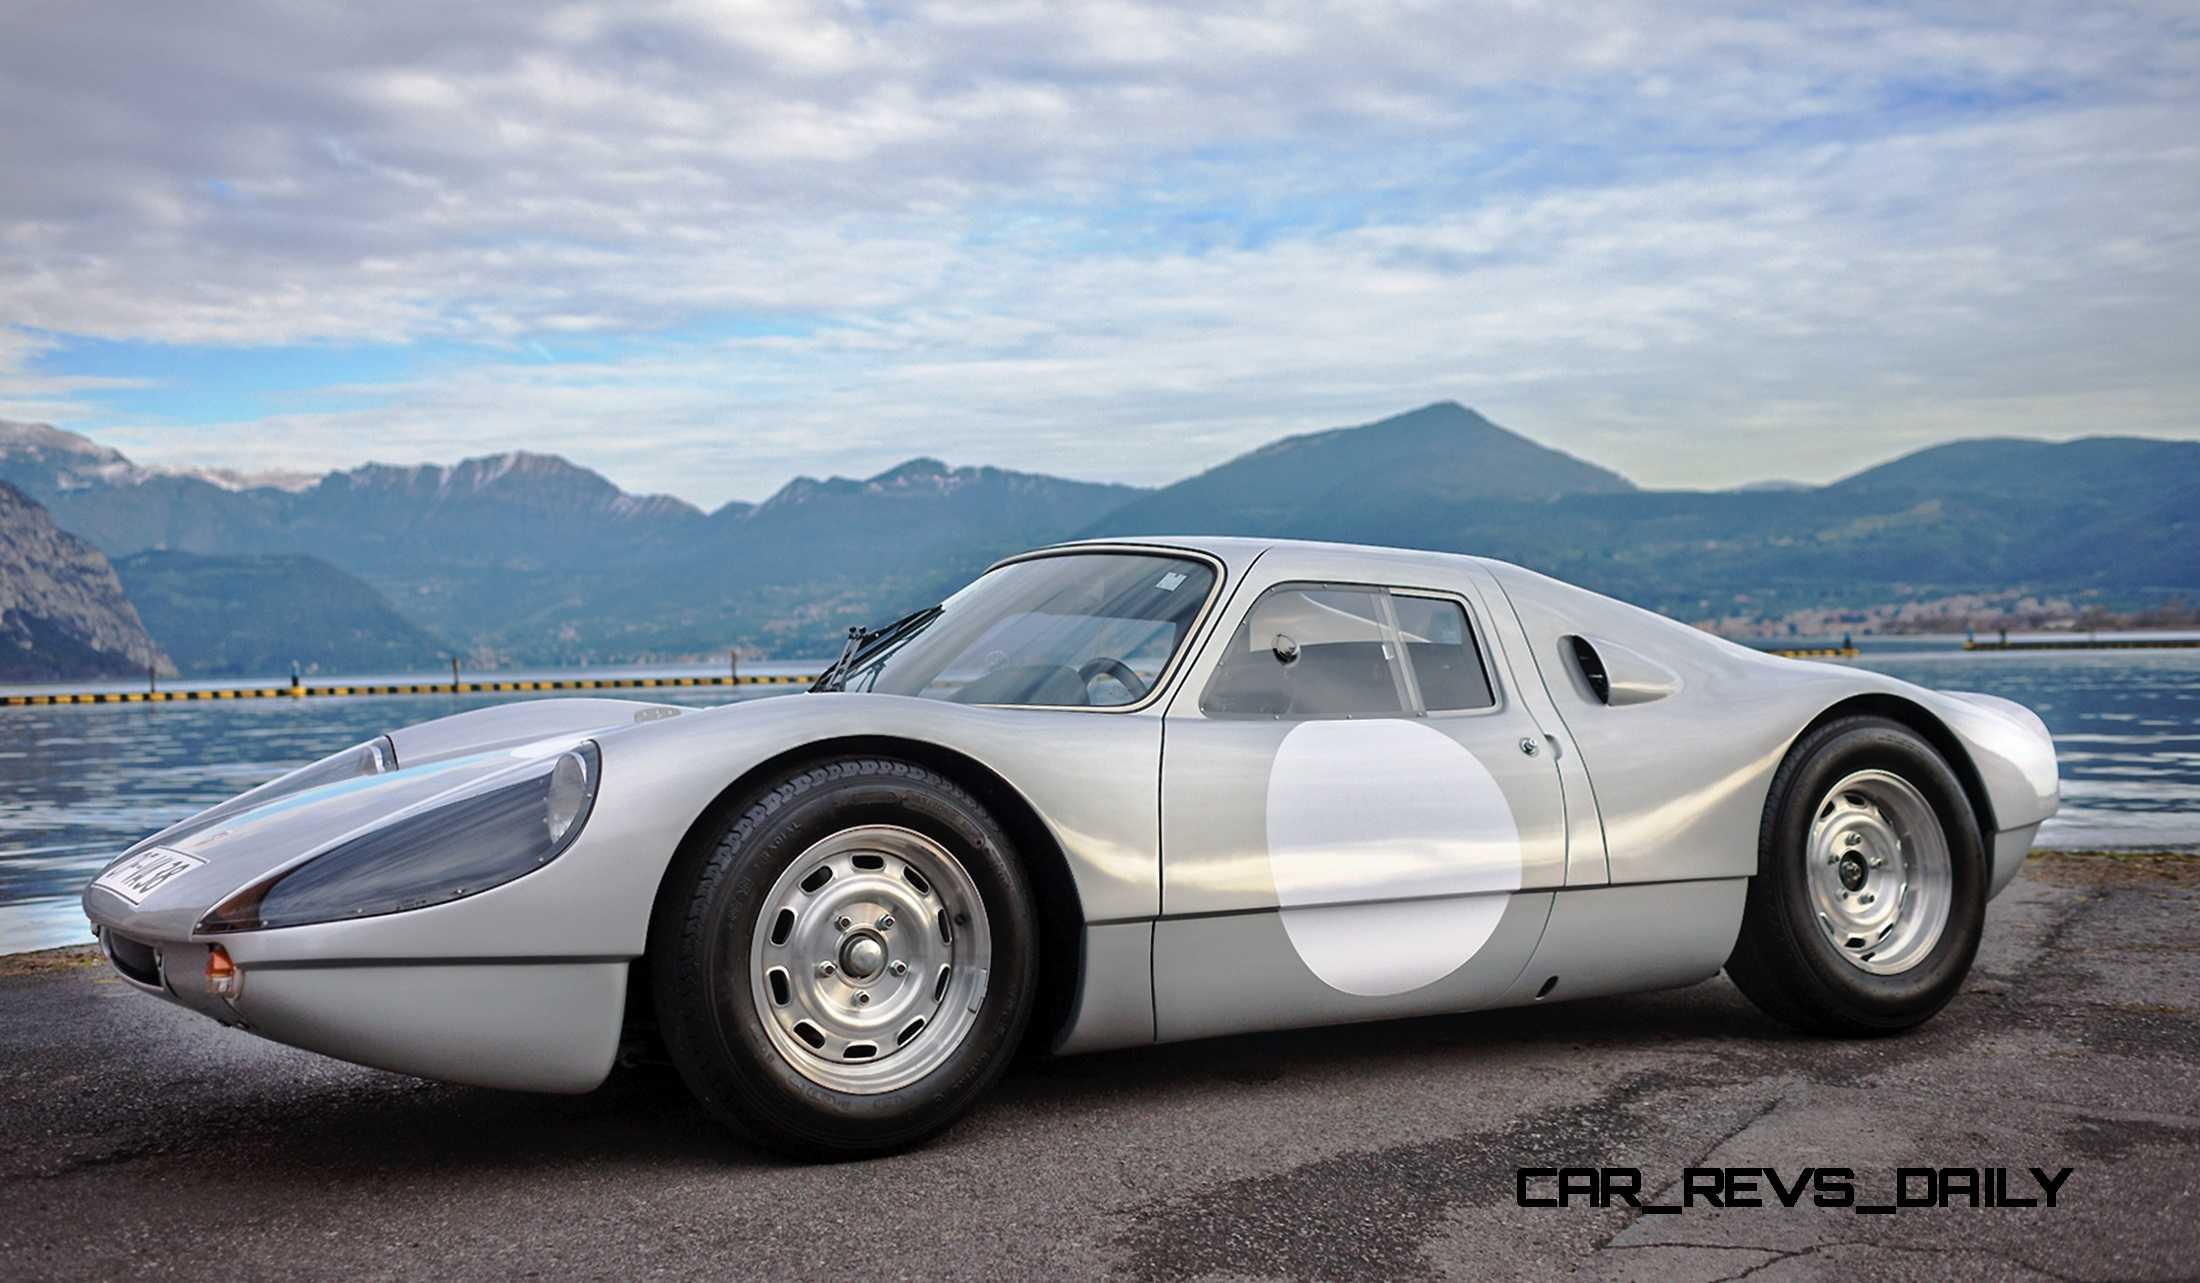 Phantom Car Wallpaper 1964 Porsche 904 Carrera Gts